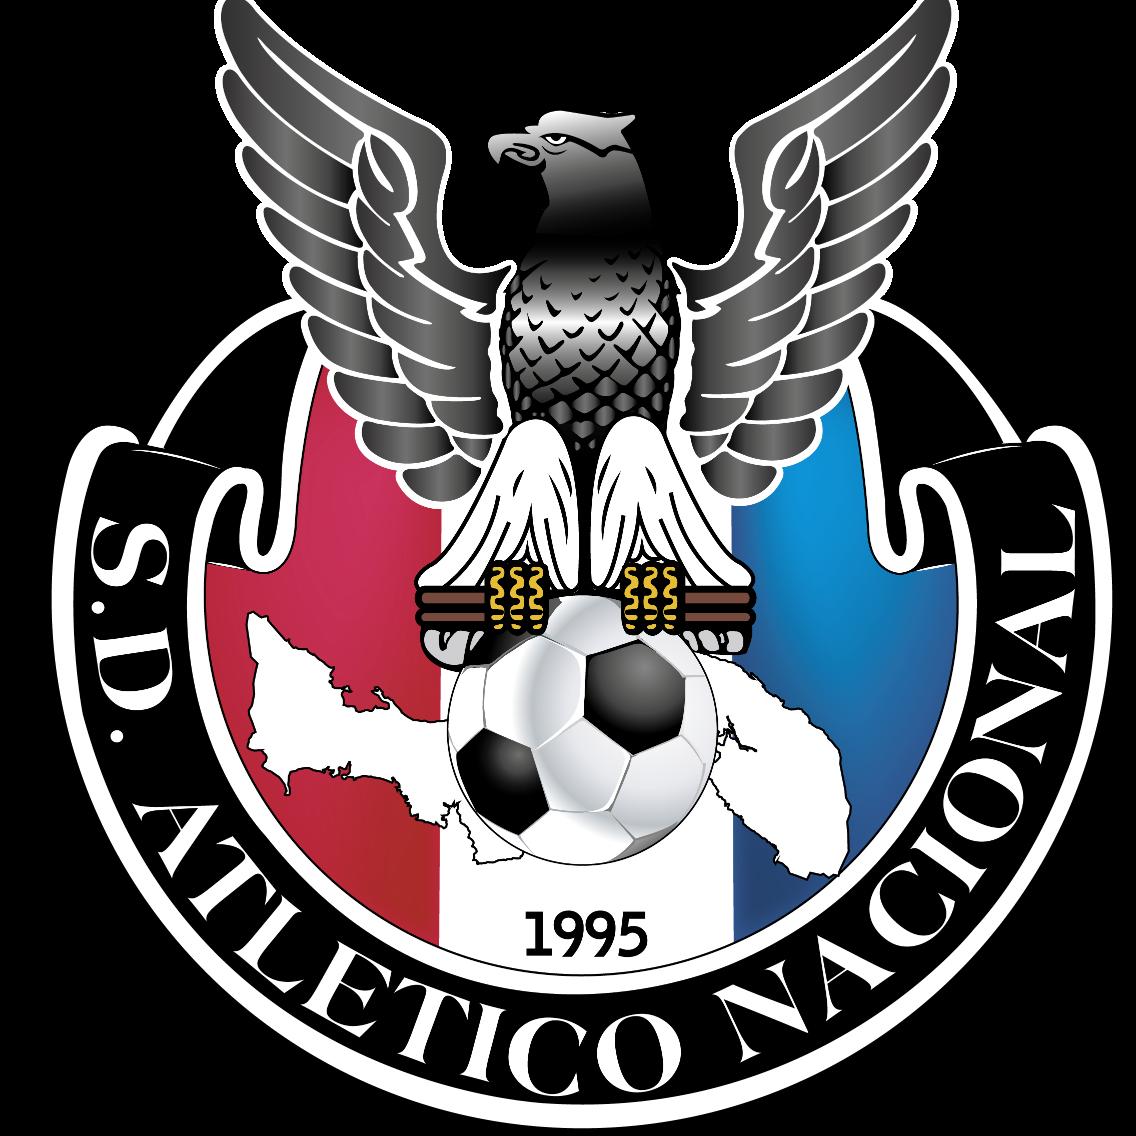 S.D. Atlético Nacional Esporte clube bahia, Sport clube